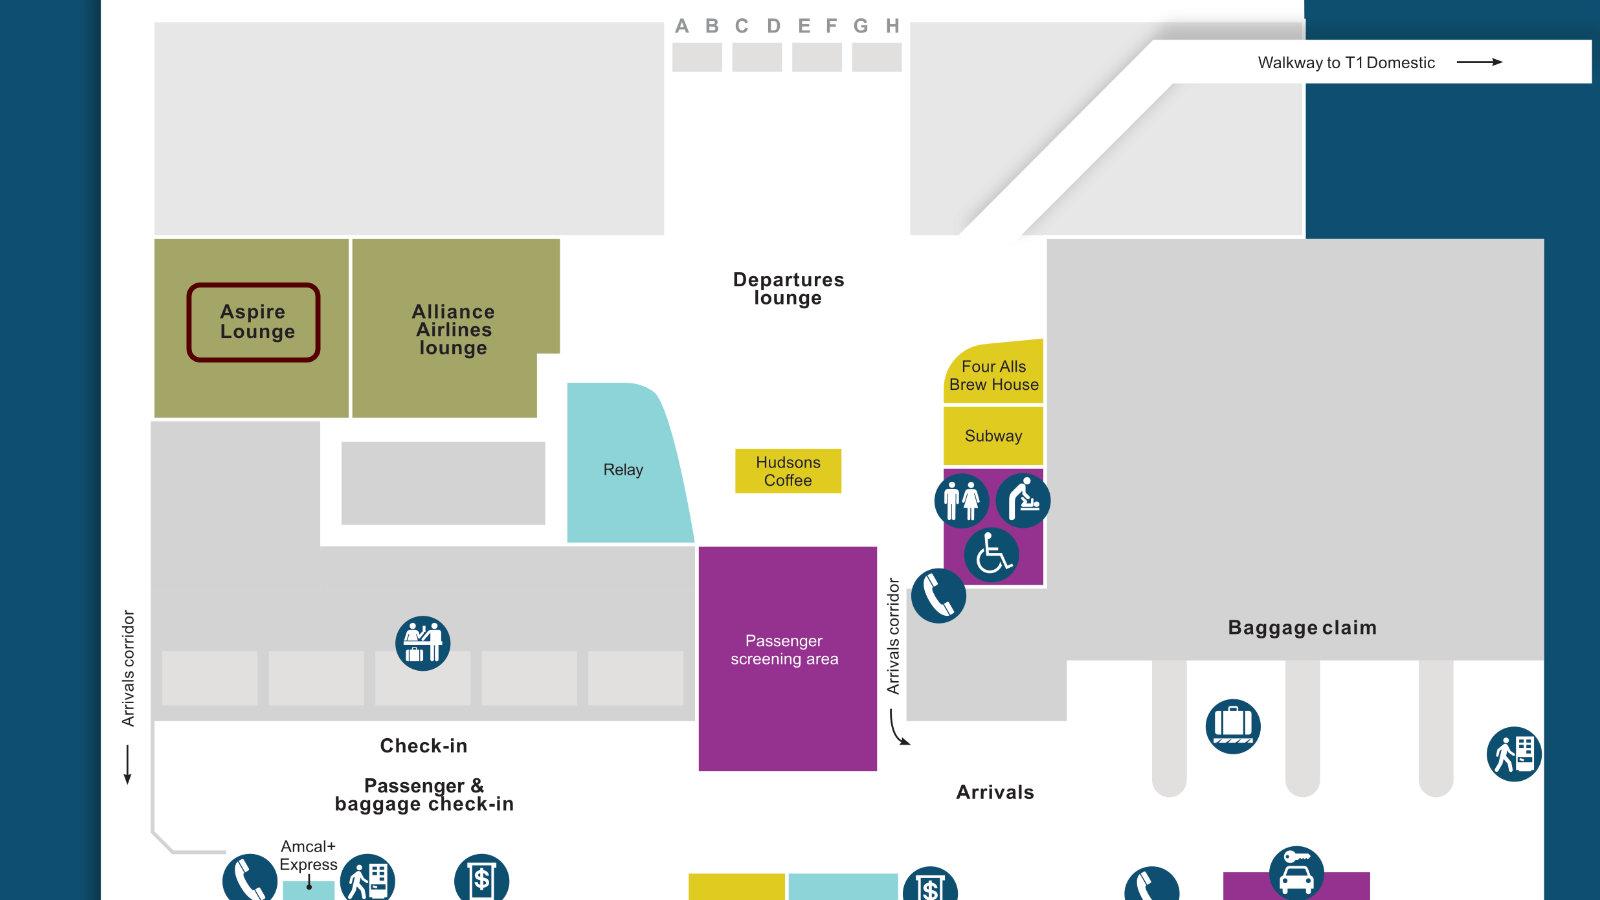 Aspire-Lounge-Perth-T2-Map